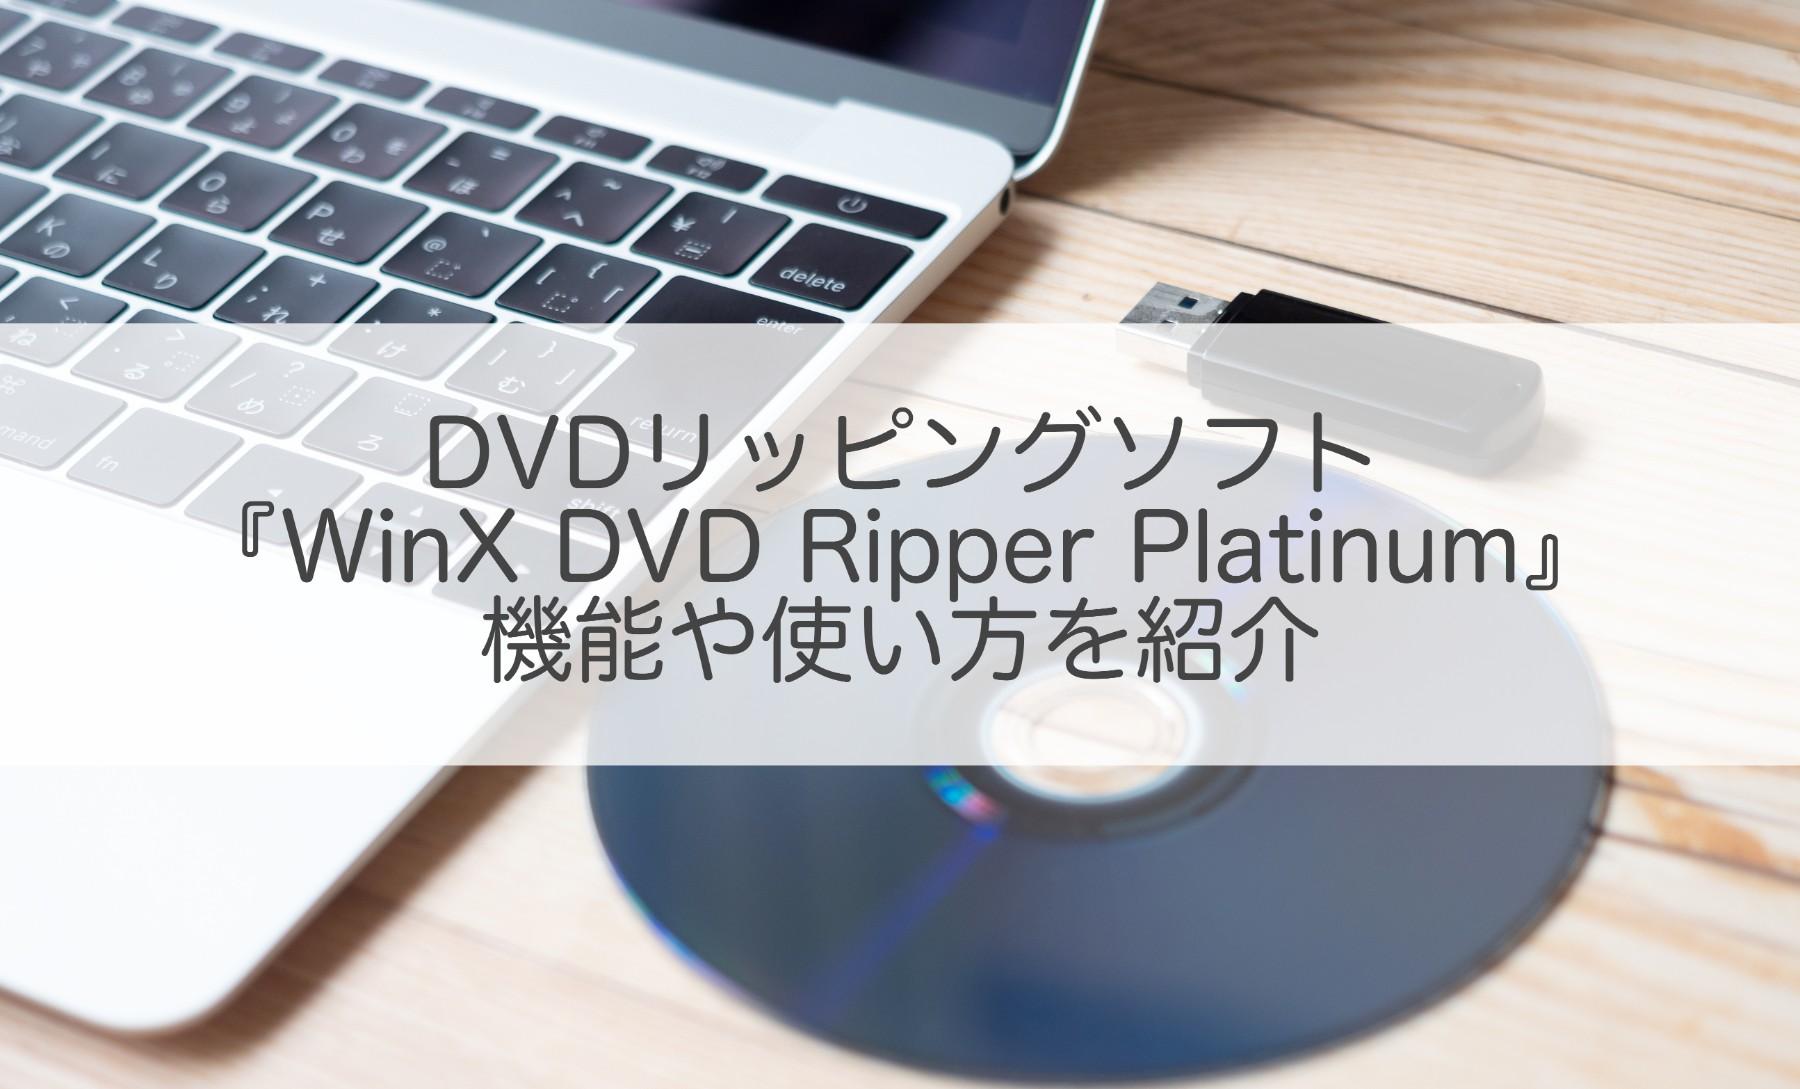 DVDリッピングソフト『WinX DVD Ripper Platinum』の機能や使い方を紹介